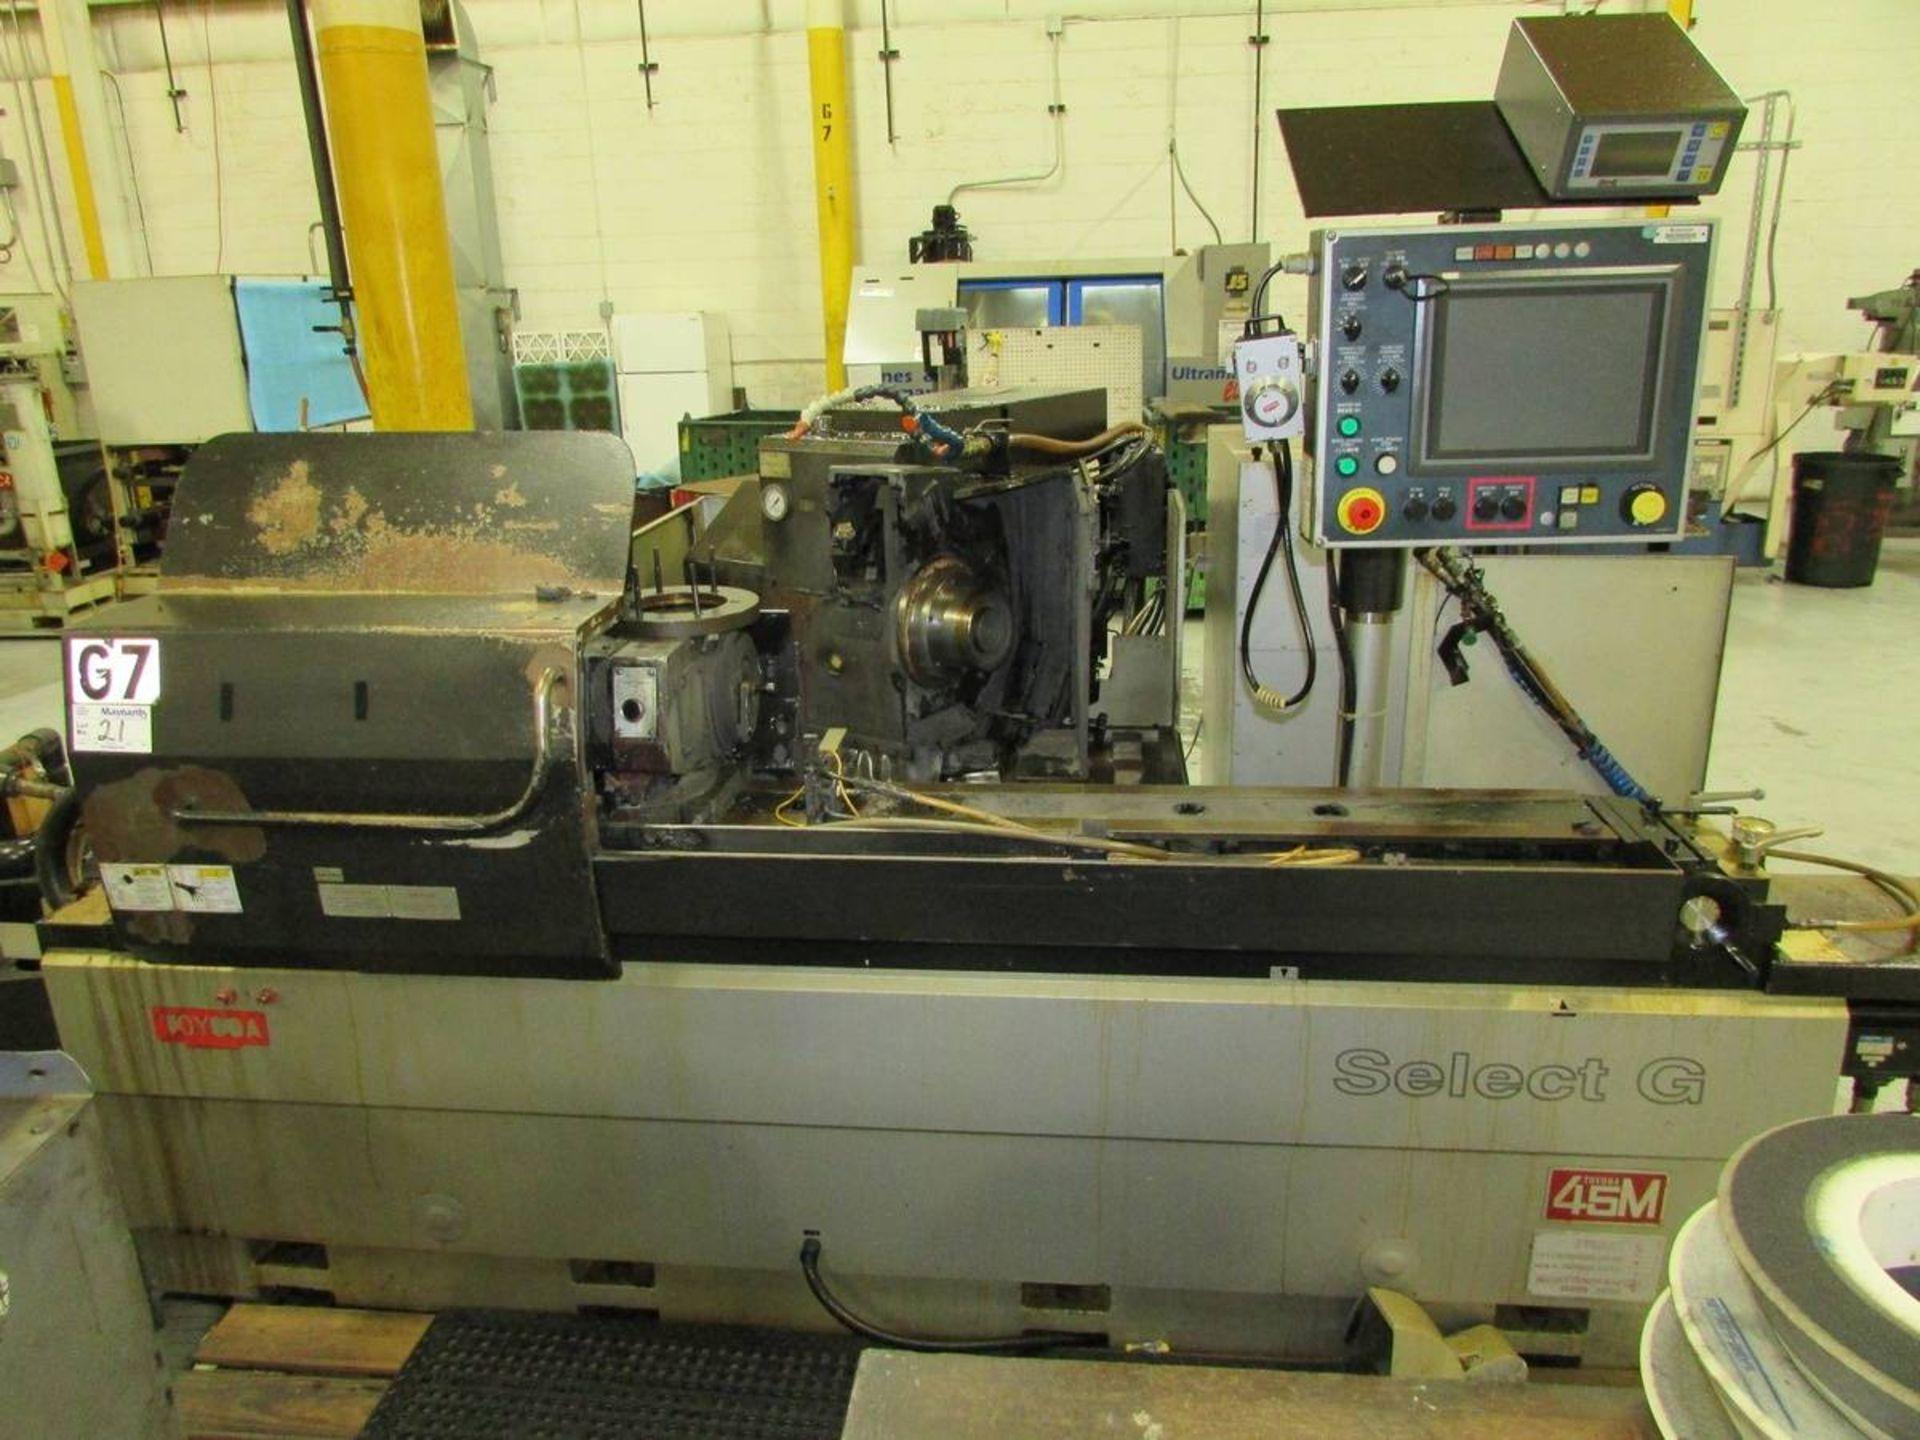 2012 Toyoda/ JTEKT 45m Select G II CNC OD Cylindrical Grinder - Image 2 of 21